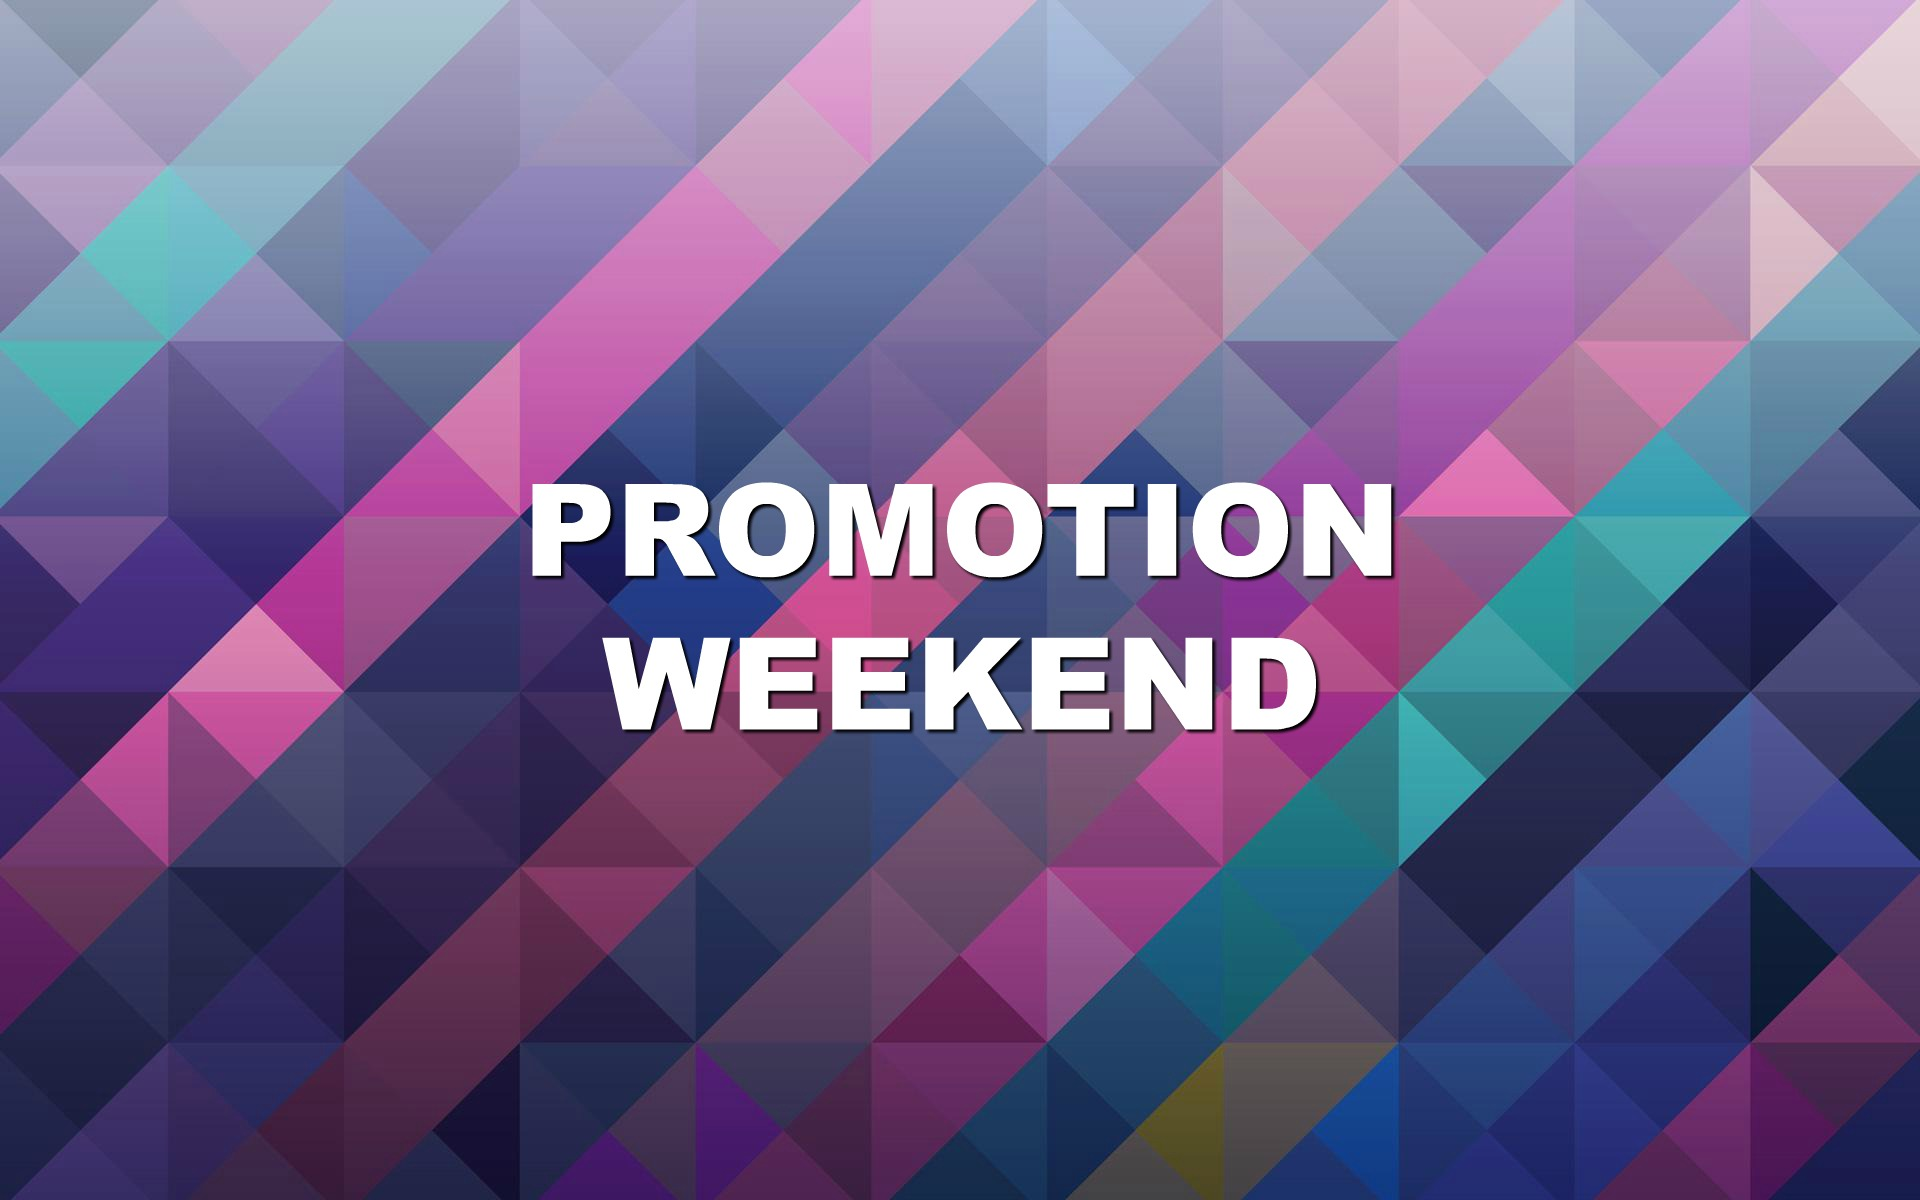 promotion222.jpg